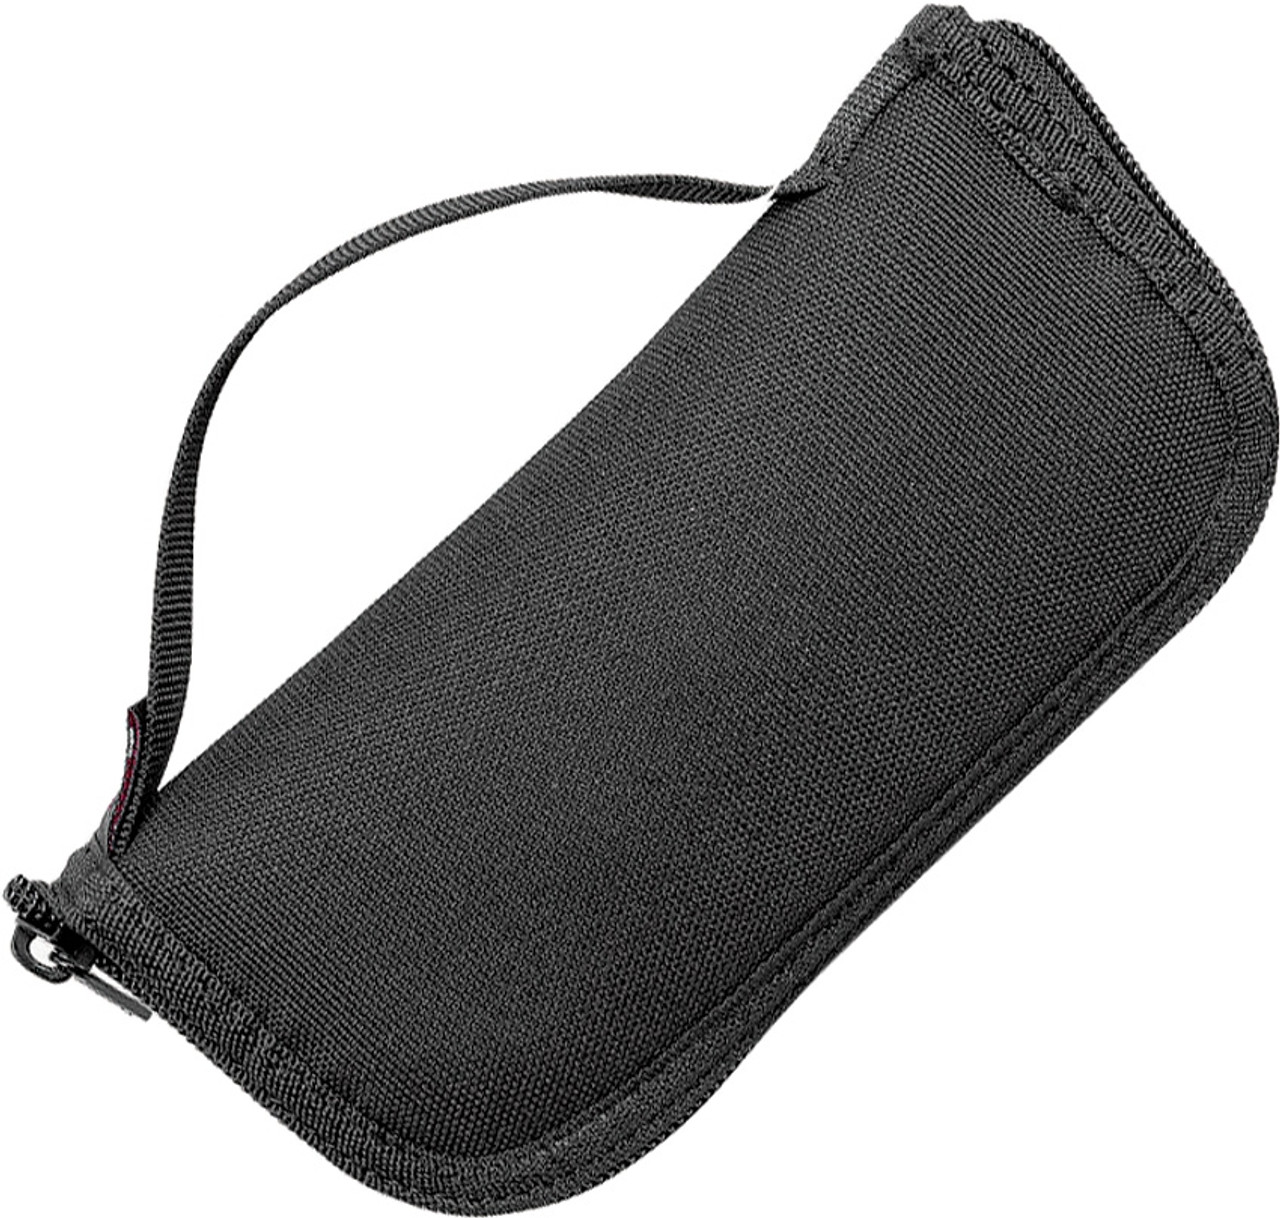 Urban Discreet EDC Bag